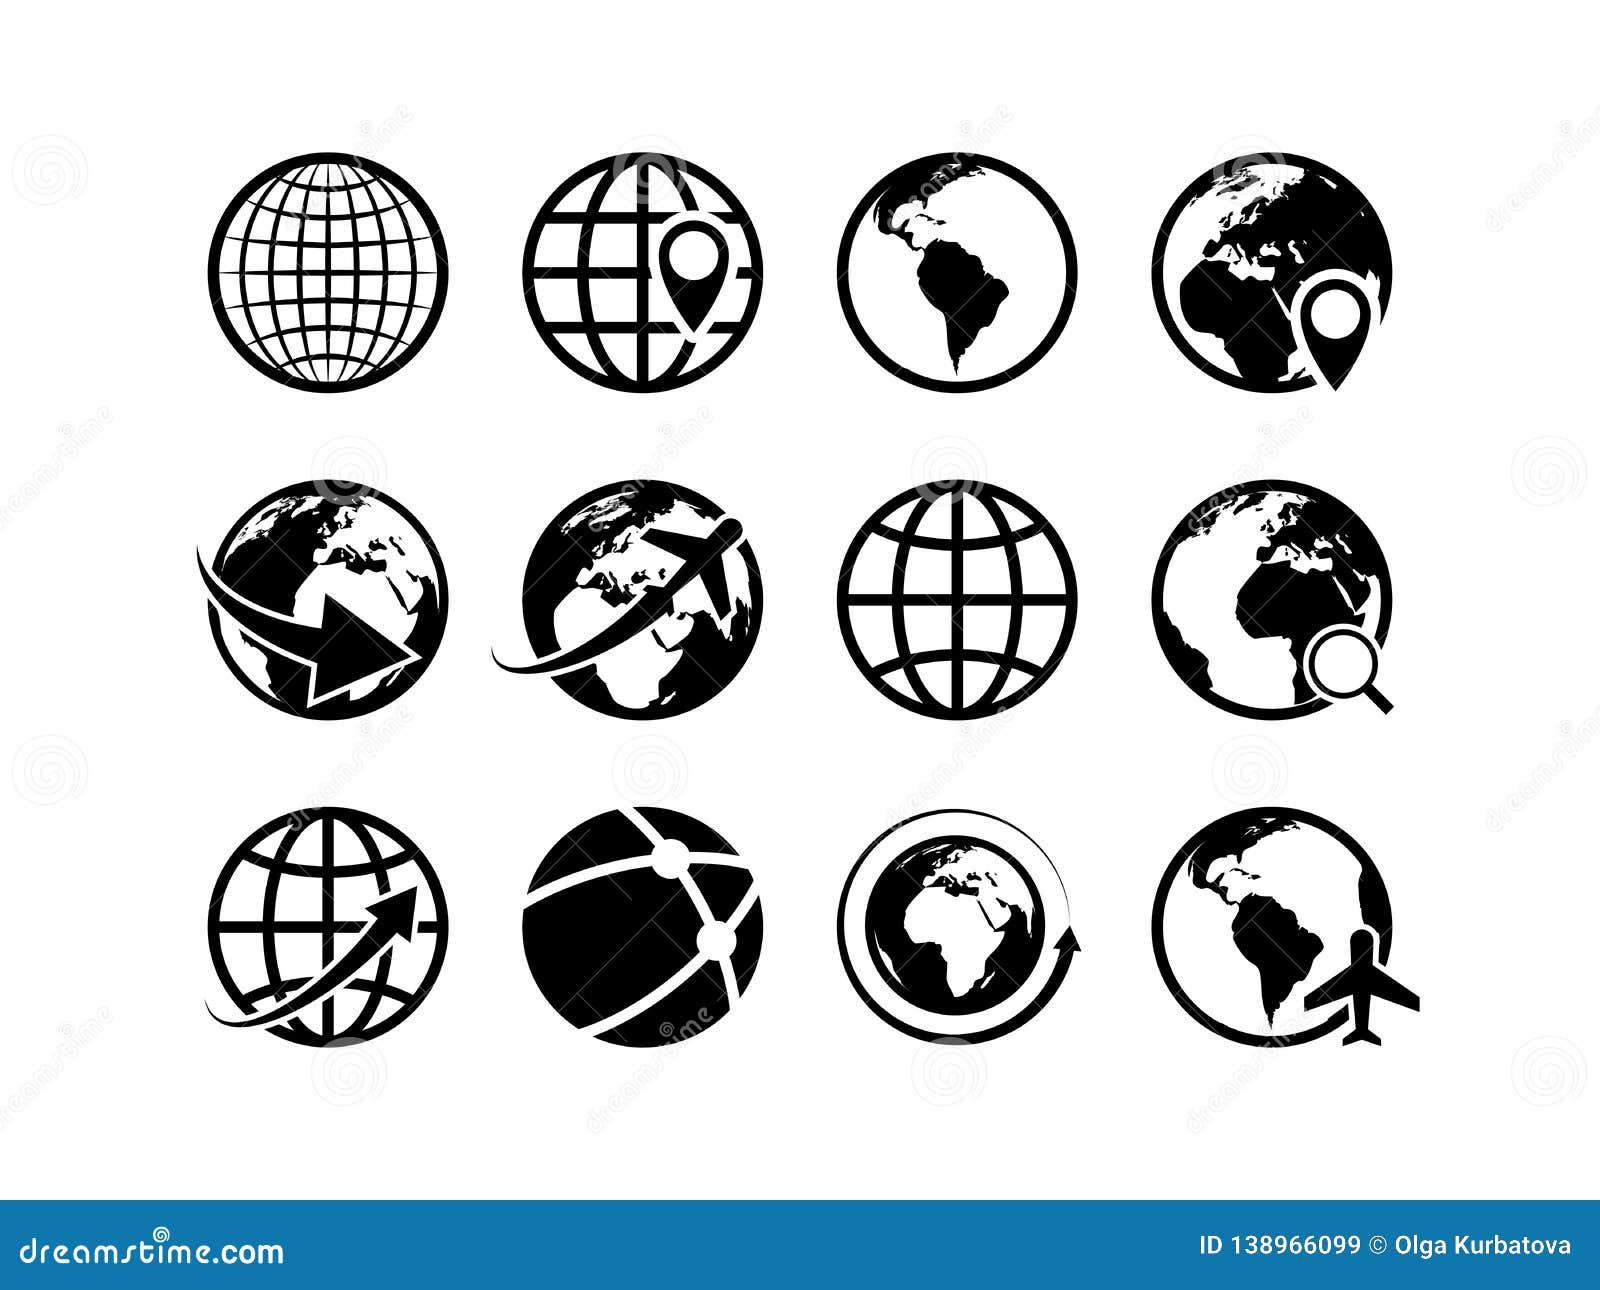 Earth Globe Icons  World Map Geography Internet Global